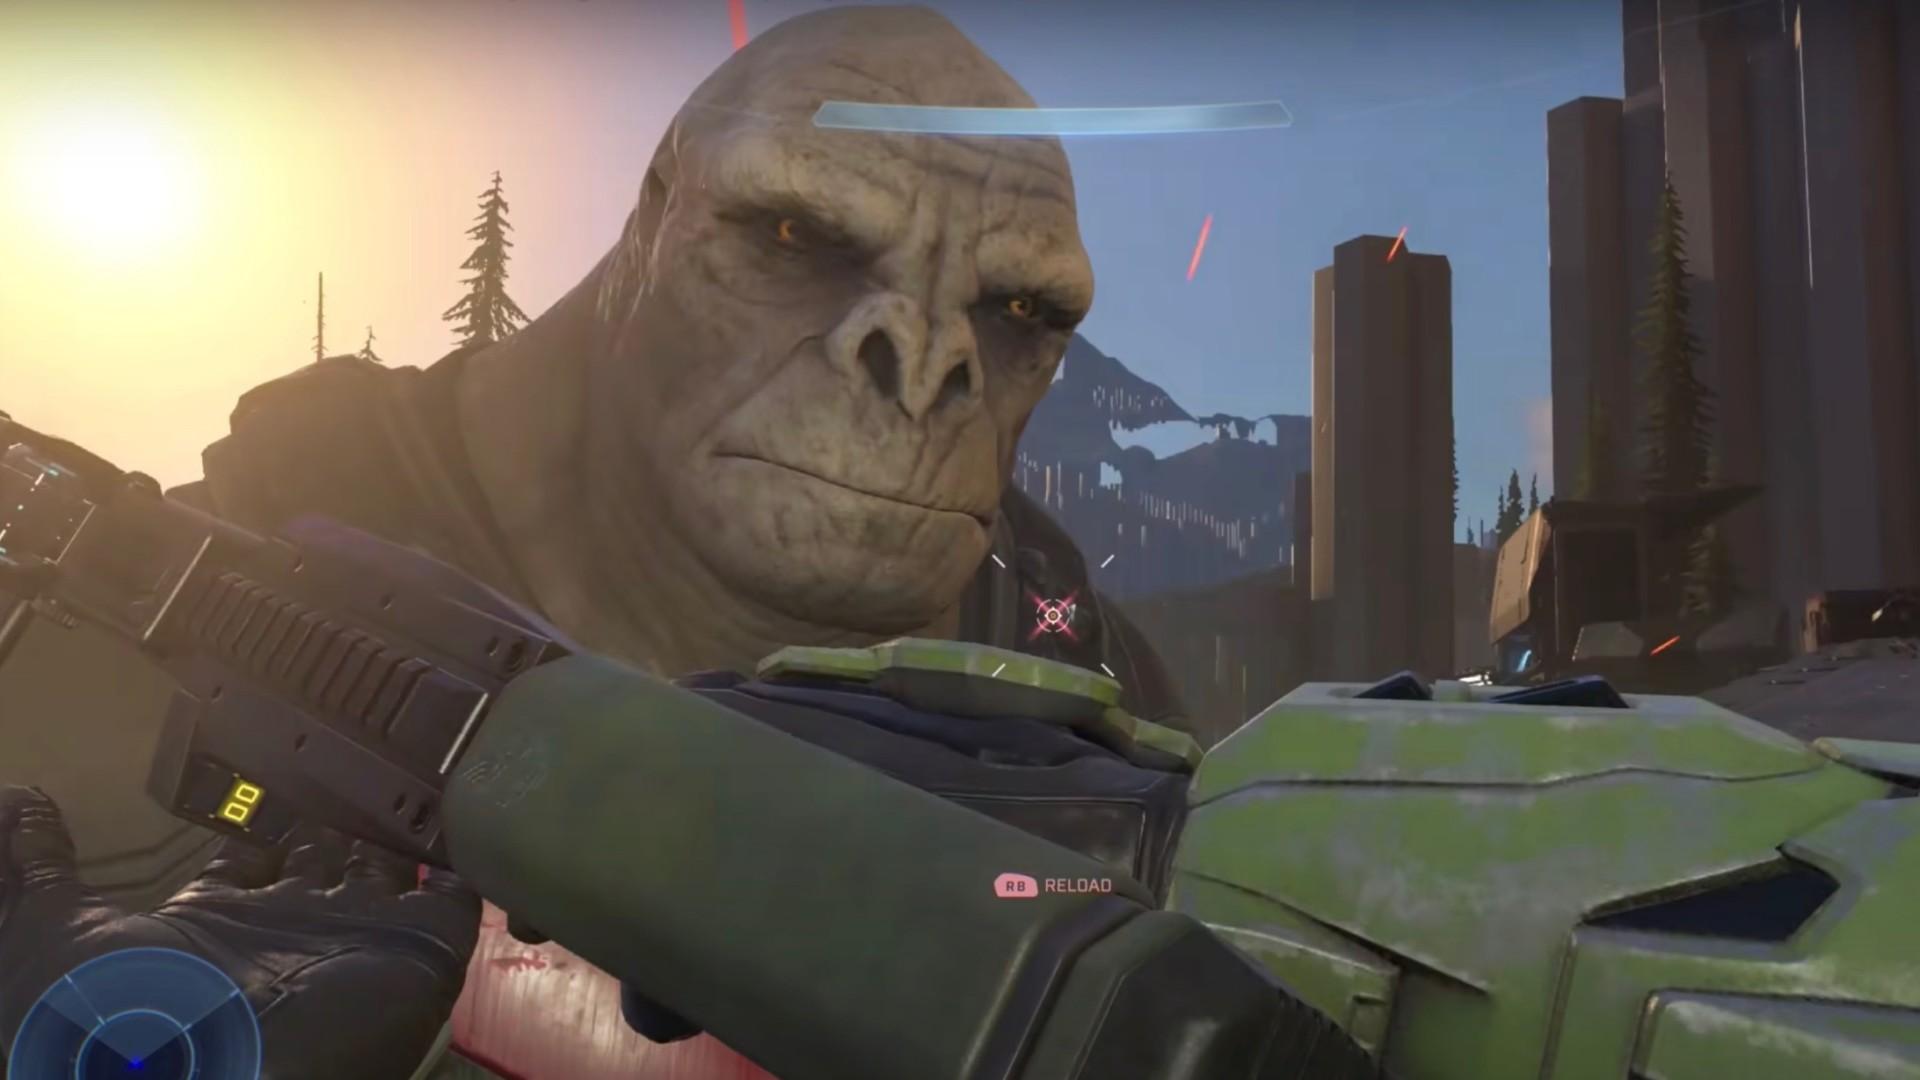 pc games of 2021 cam